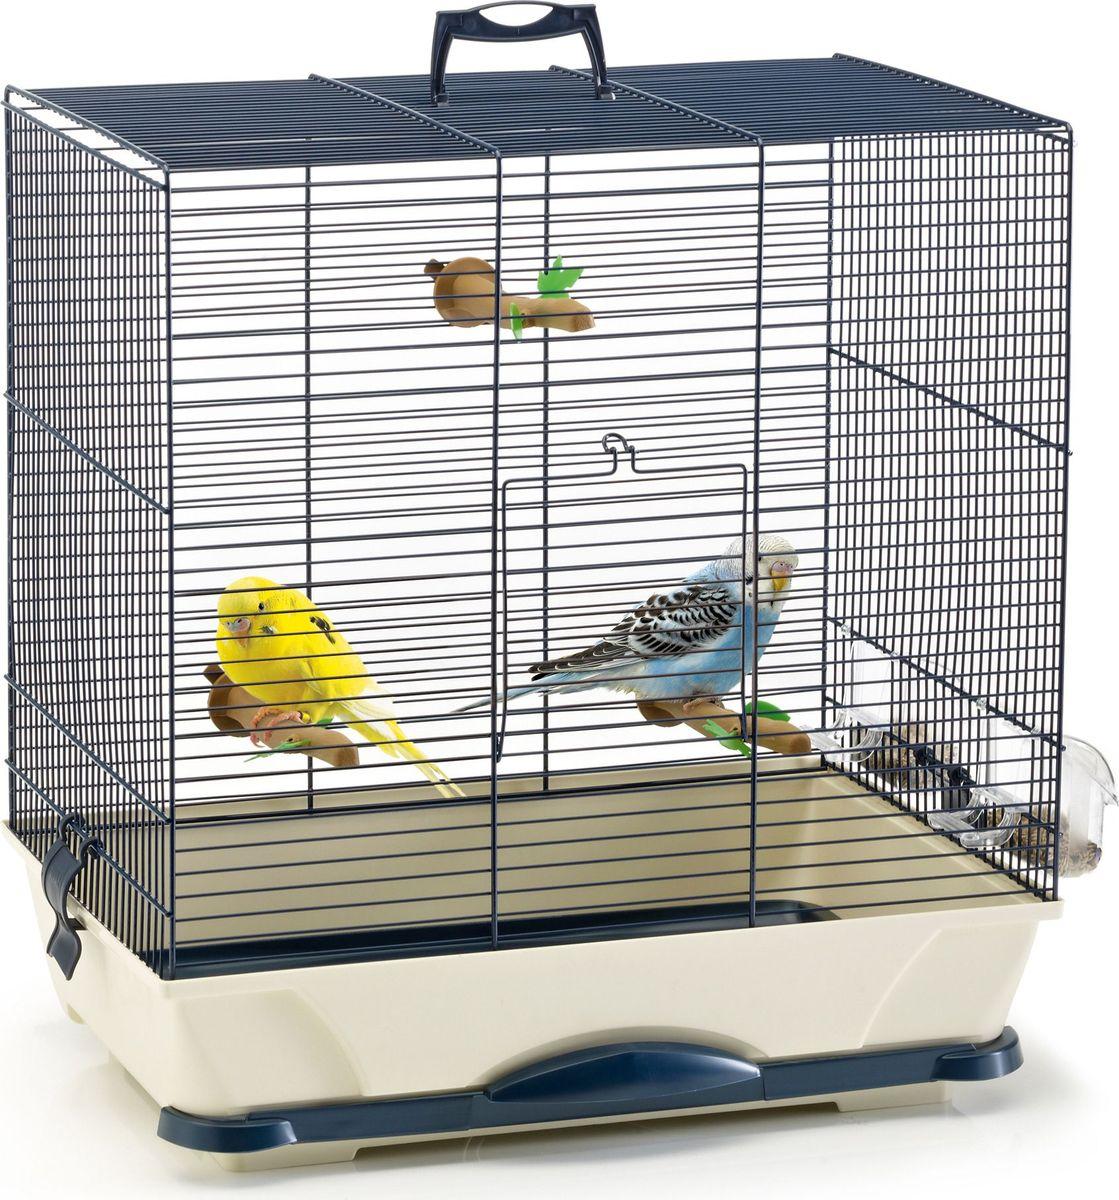 Клетка для птиц Savic  Primo , цвет: синий, голубой, 46 х 32 х 48 см - Клетки, вольеры, будки